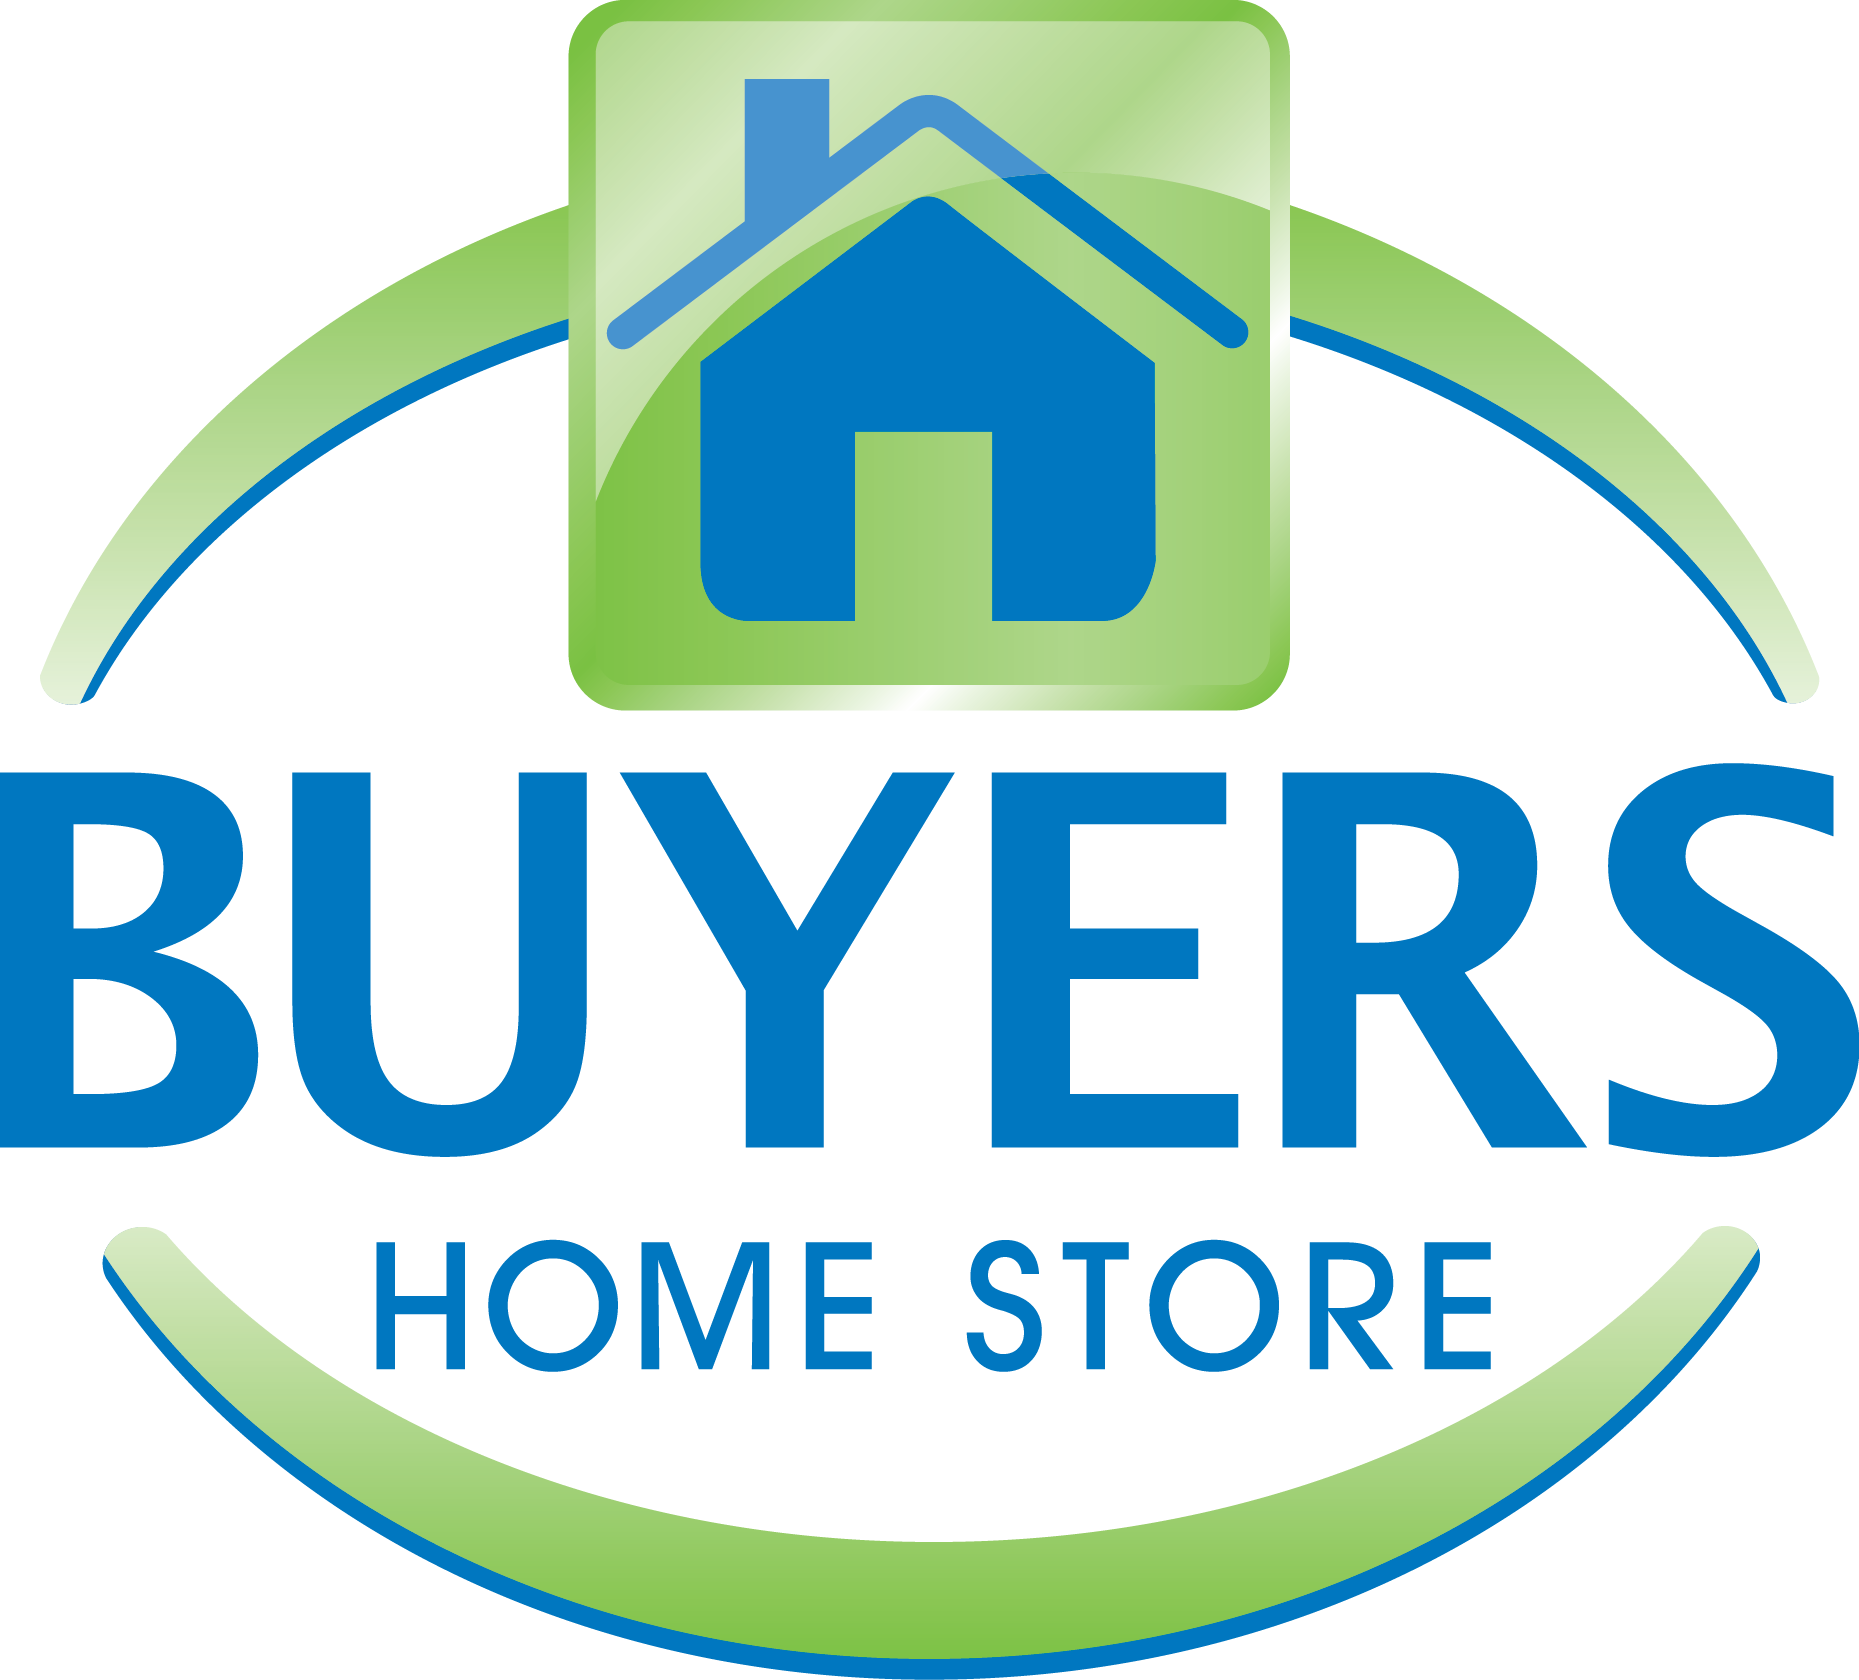 buyerslogo(c)